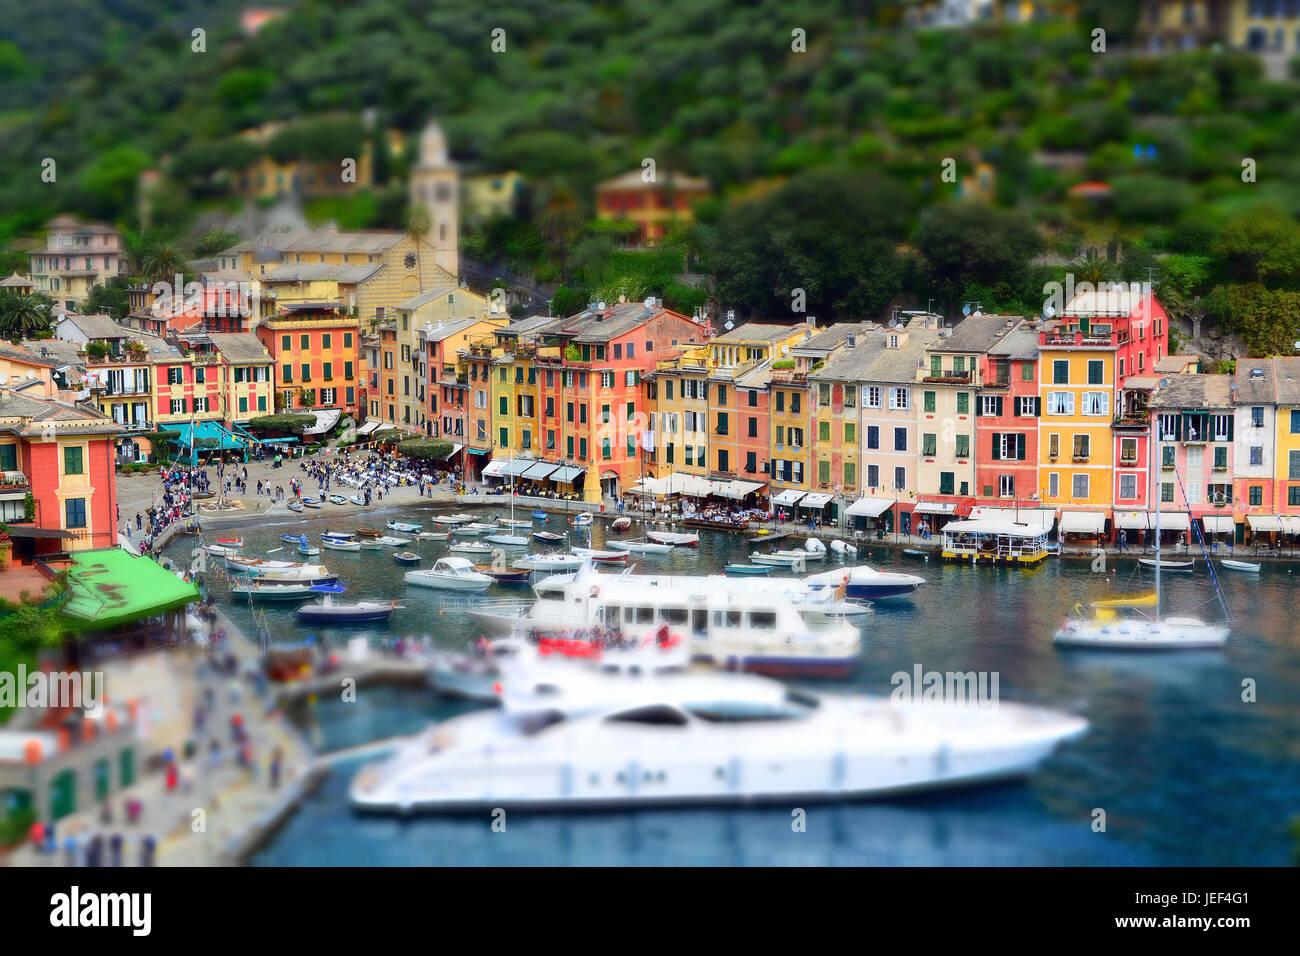 Portofino, a pretty town on the coast of the Mediterranean Sea, in Liguria, Italy., eine hübsche Stadt an der - Stock Image